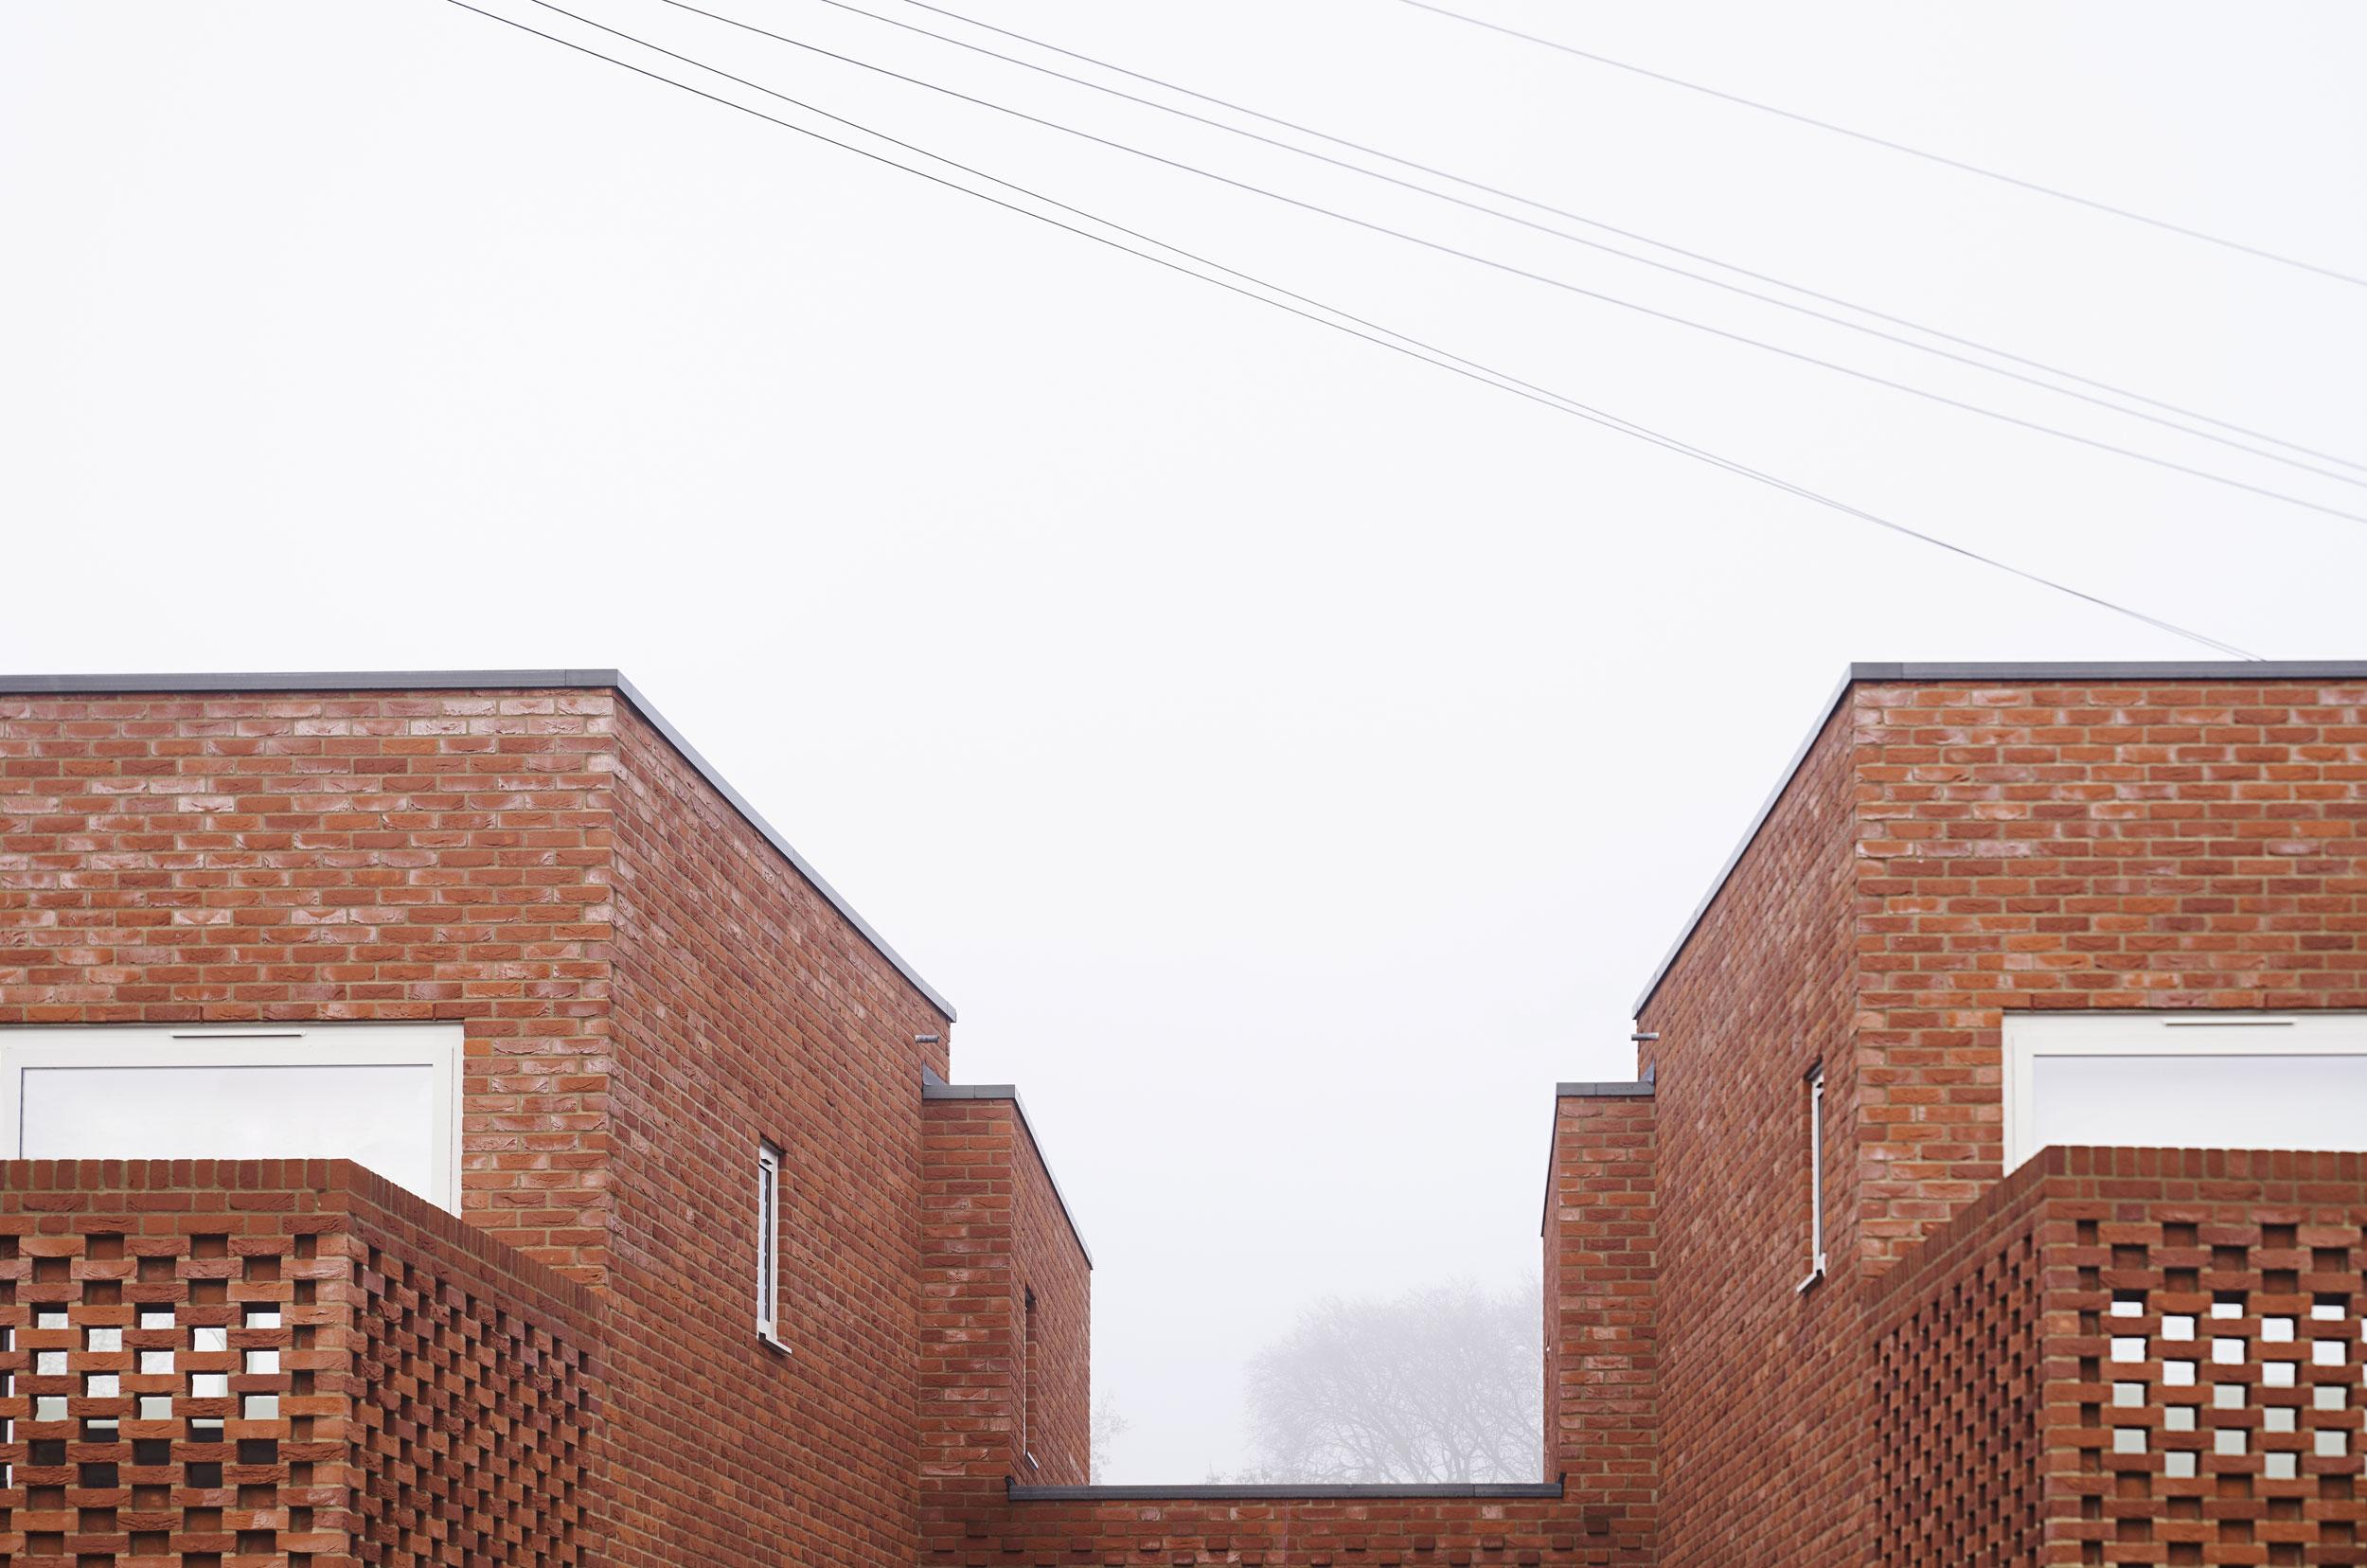 Hudson-Rose-Valley-Fiona-Burrage-exterior-roof.jpg